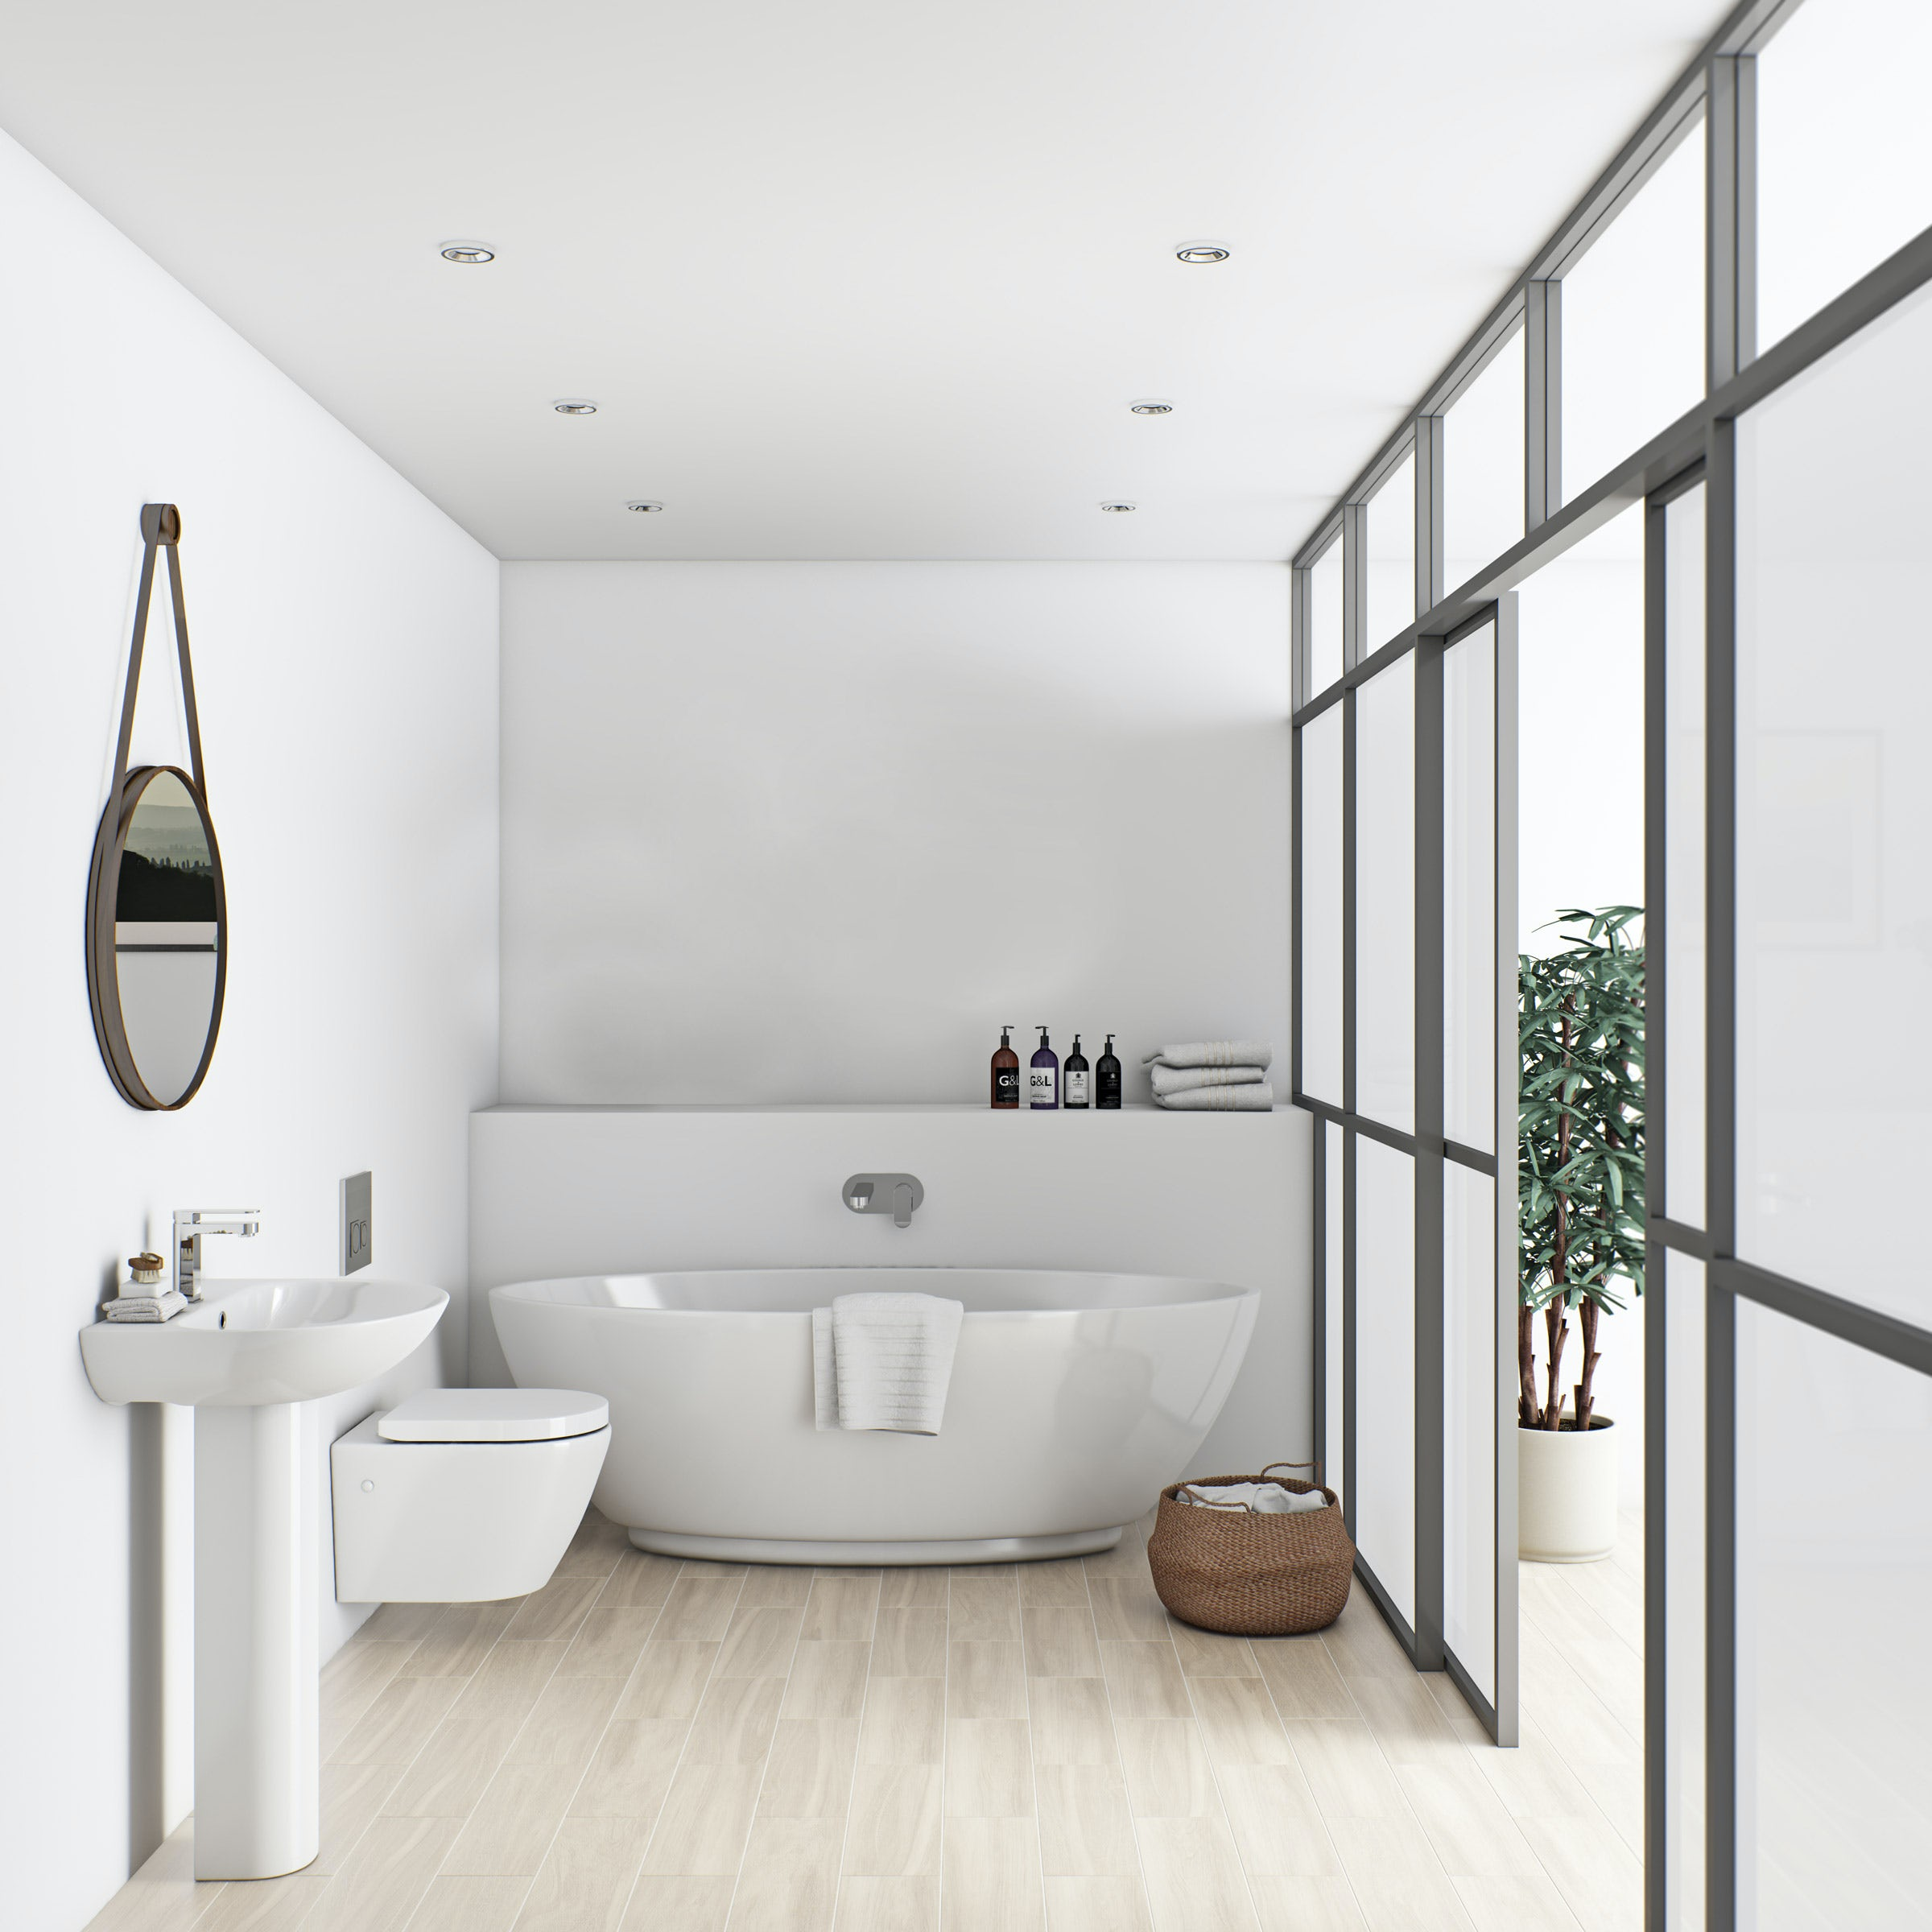 Mode Harrison Bathroom Suite With Freestanding Bath 1790 X 810